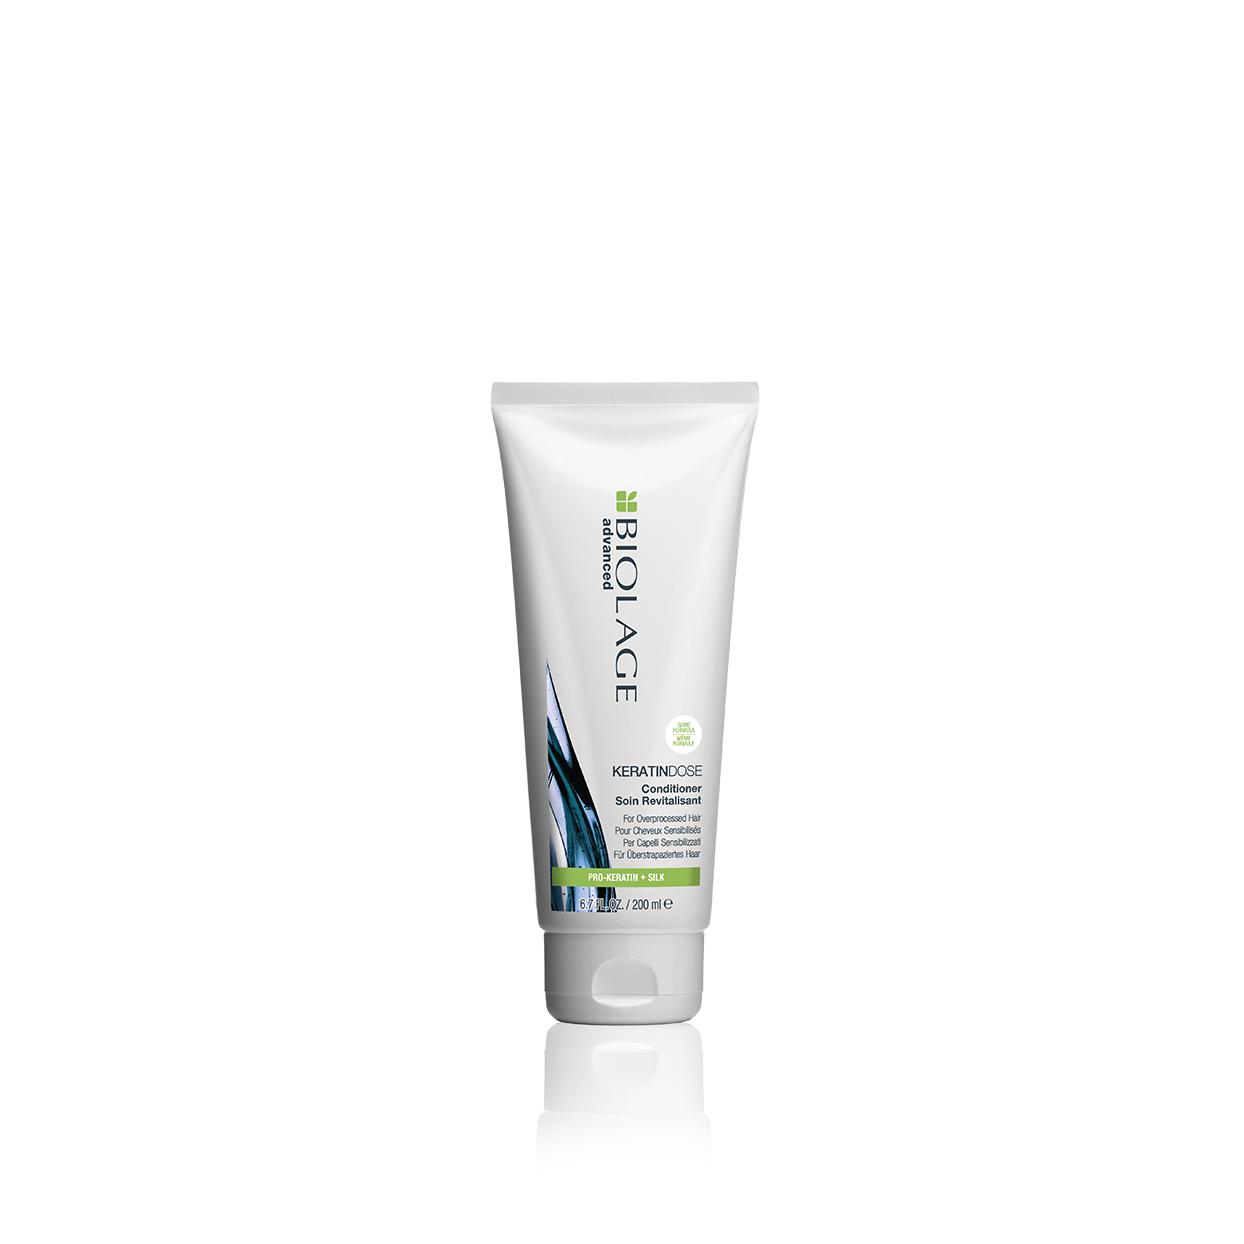 Biolage Advanced KeratinDose Damage Care Conditioner Nourishing Conditioner for Damaged Hair